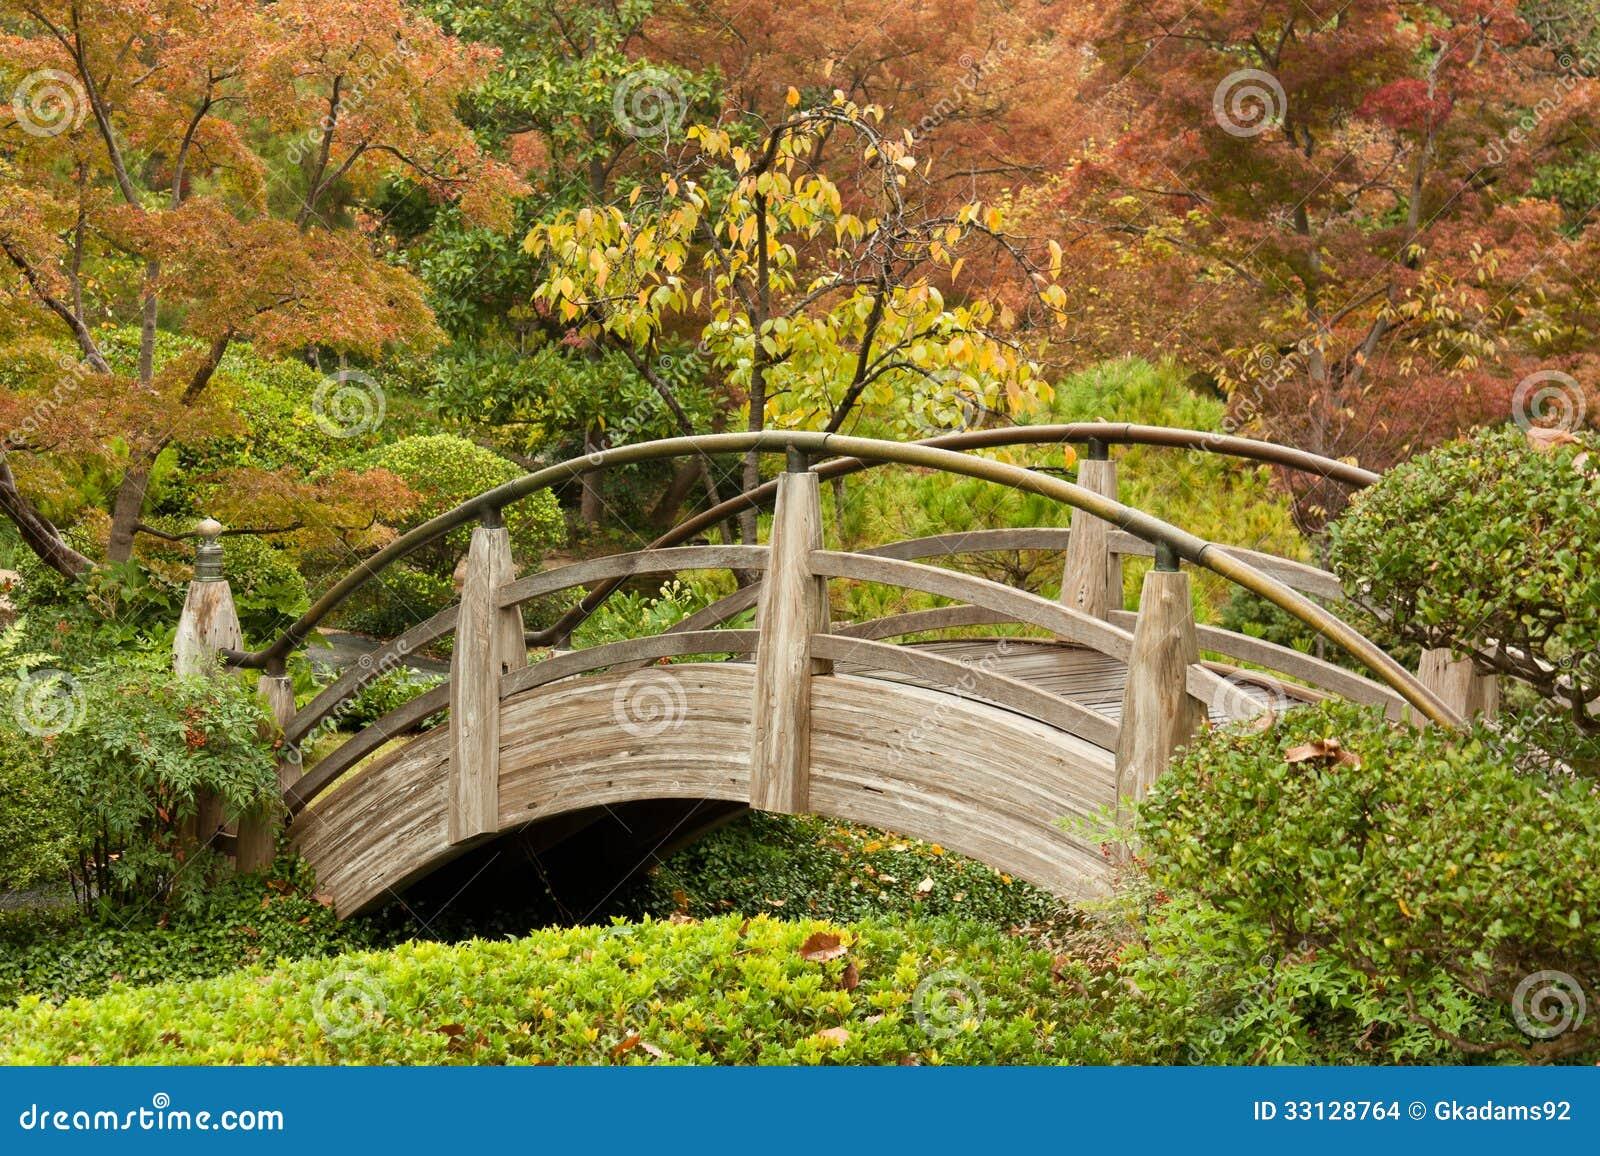 Japanese Wooden Garden Bridge japanese wooden garden bridge - home design ideas